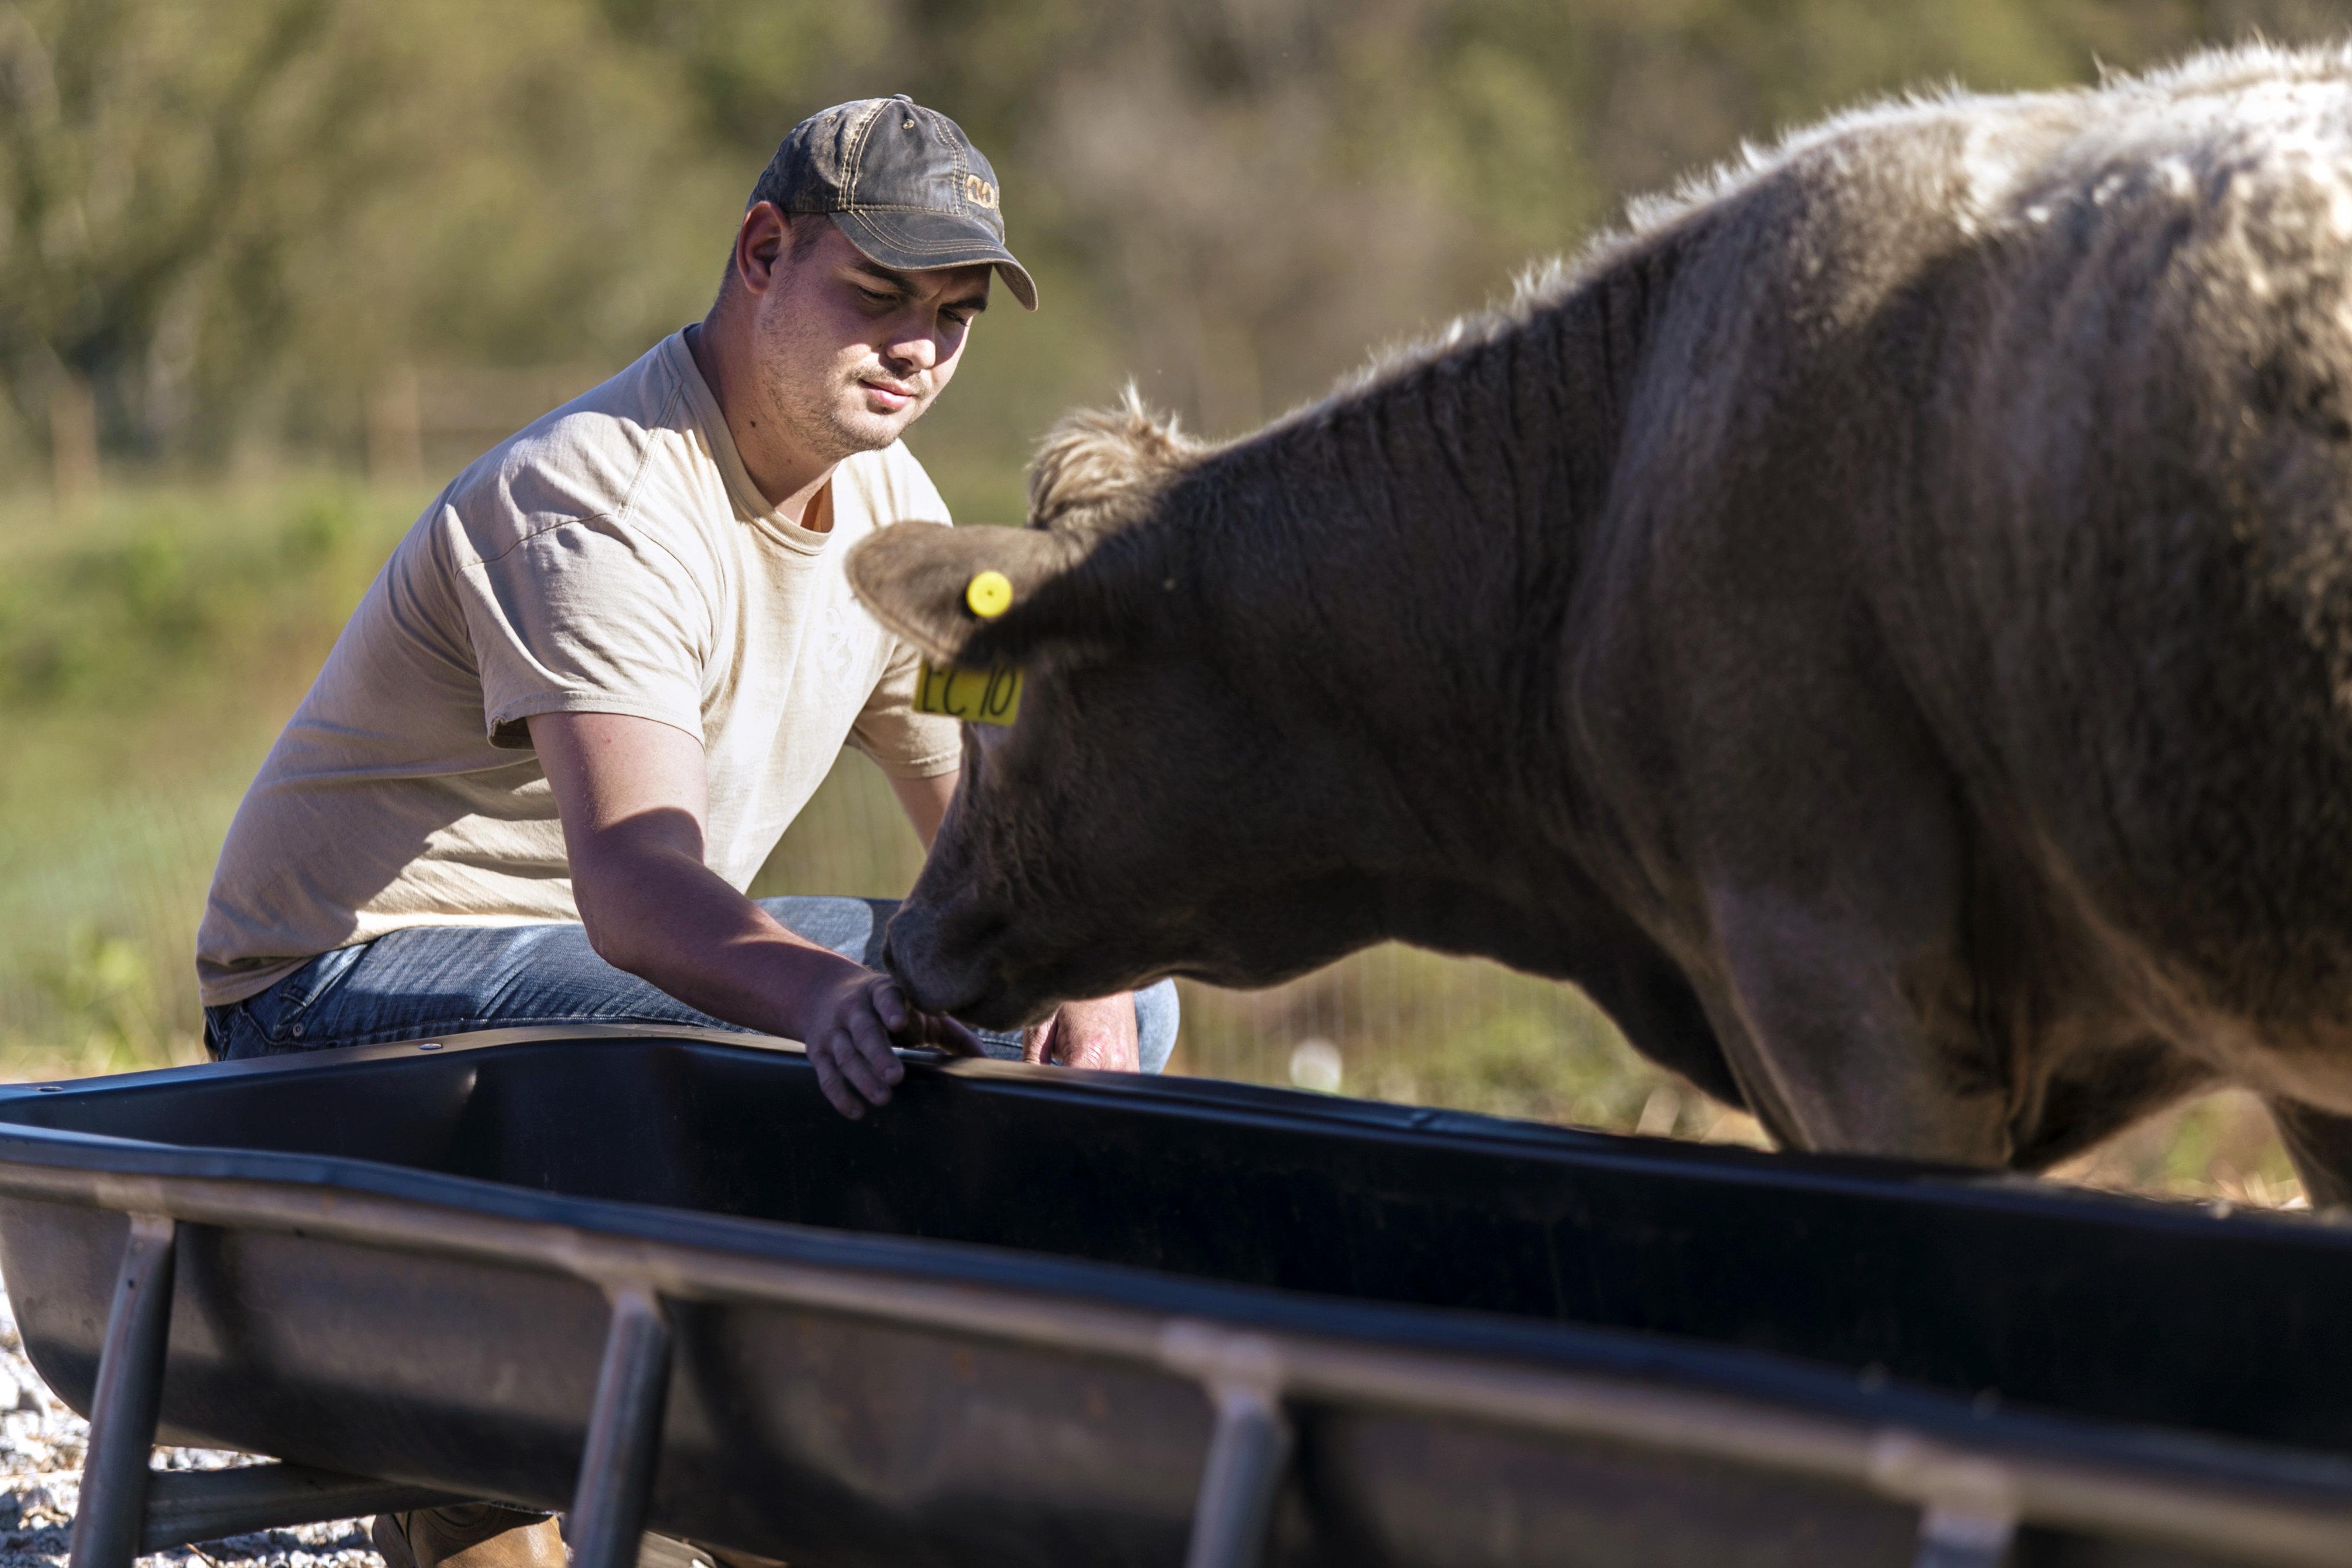 Student feeding a cow